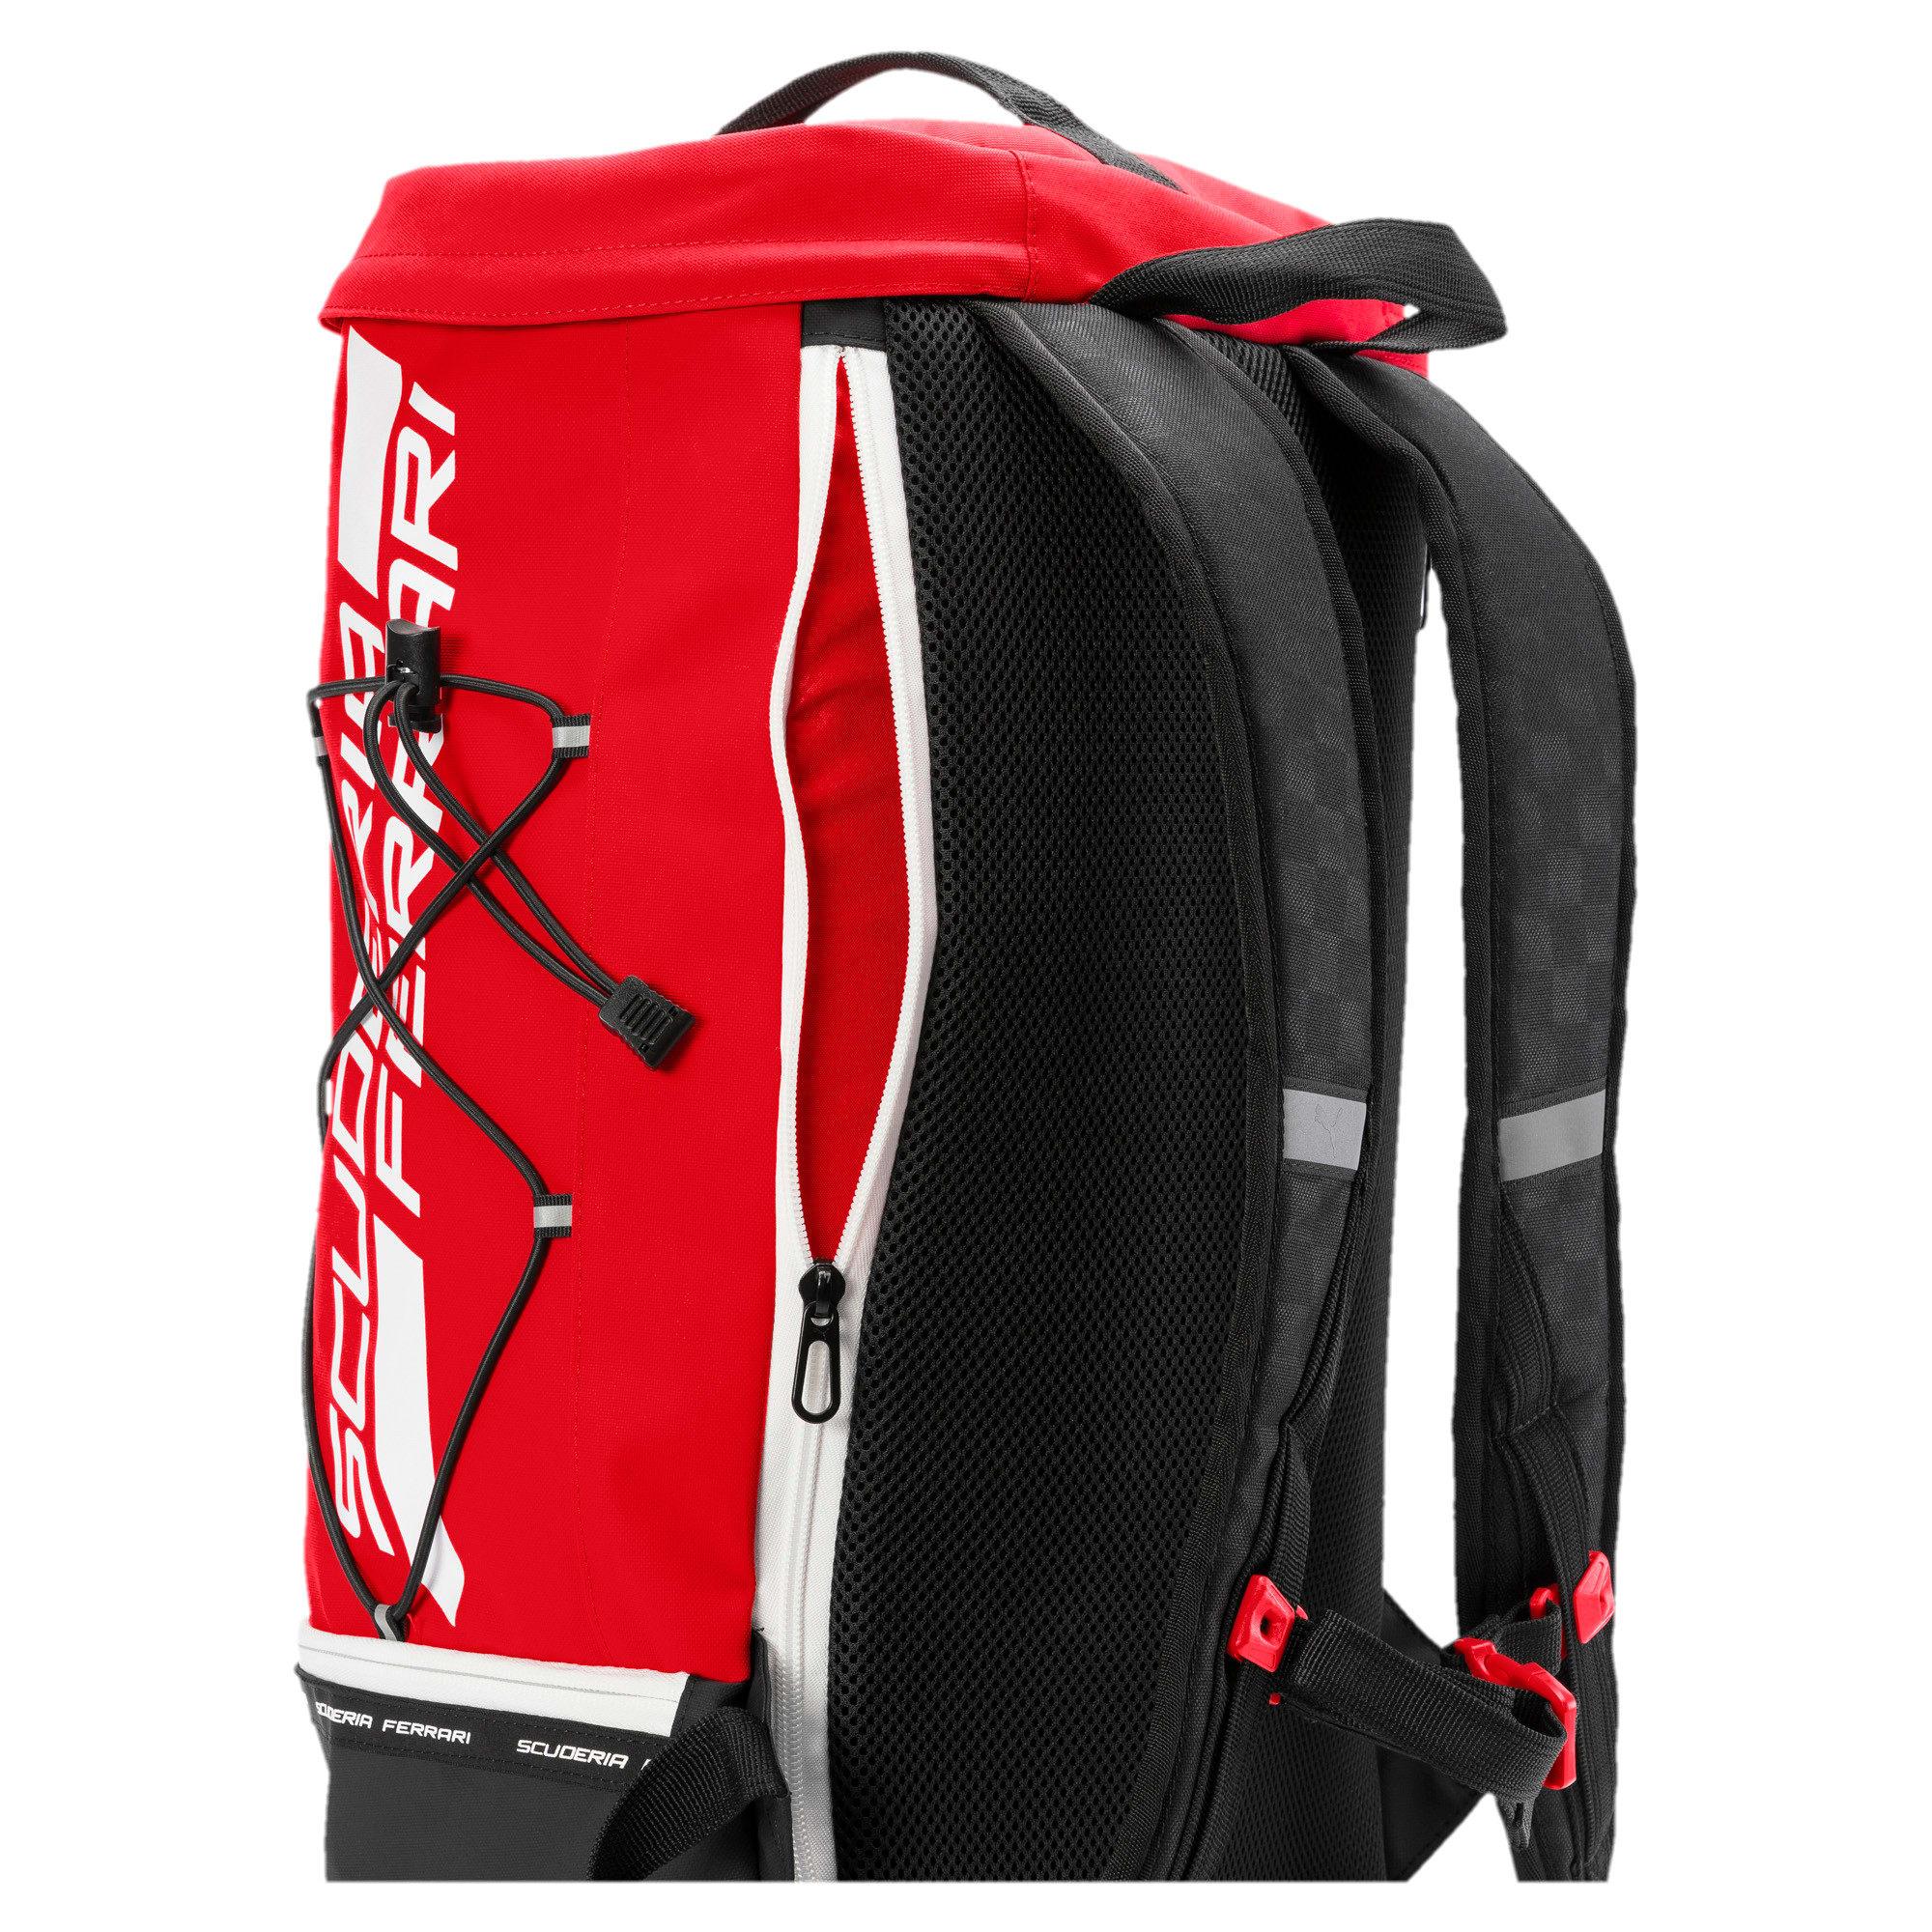 Thumbnail 6 of Ferrari Fanwear RCT Backpack, Rosso Corsa, medium-IND